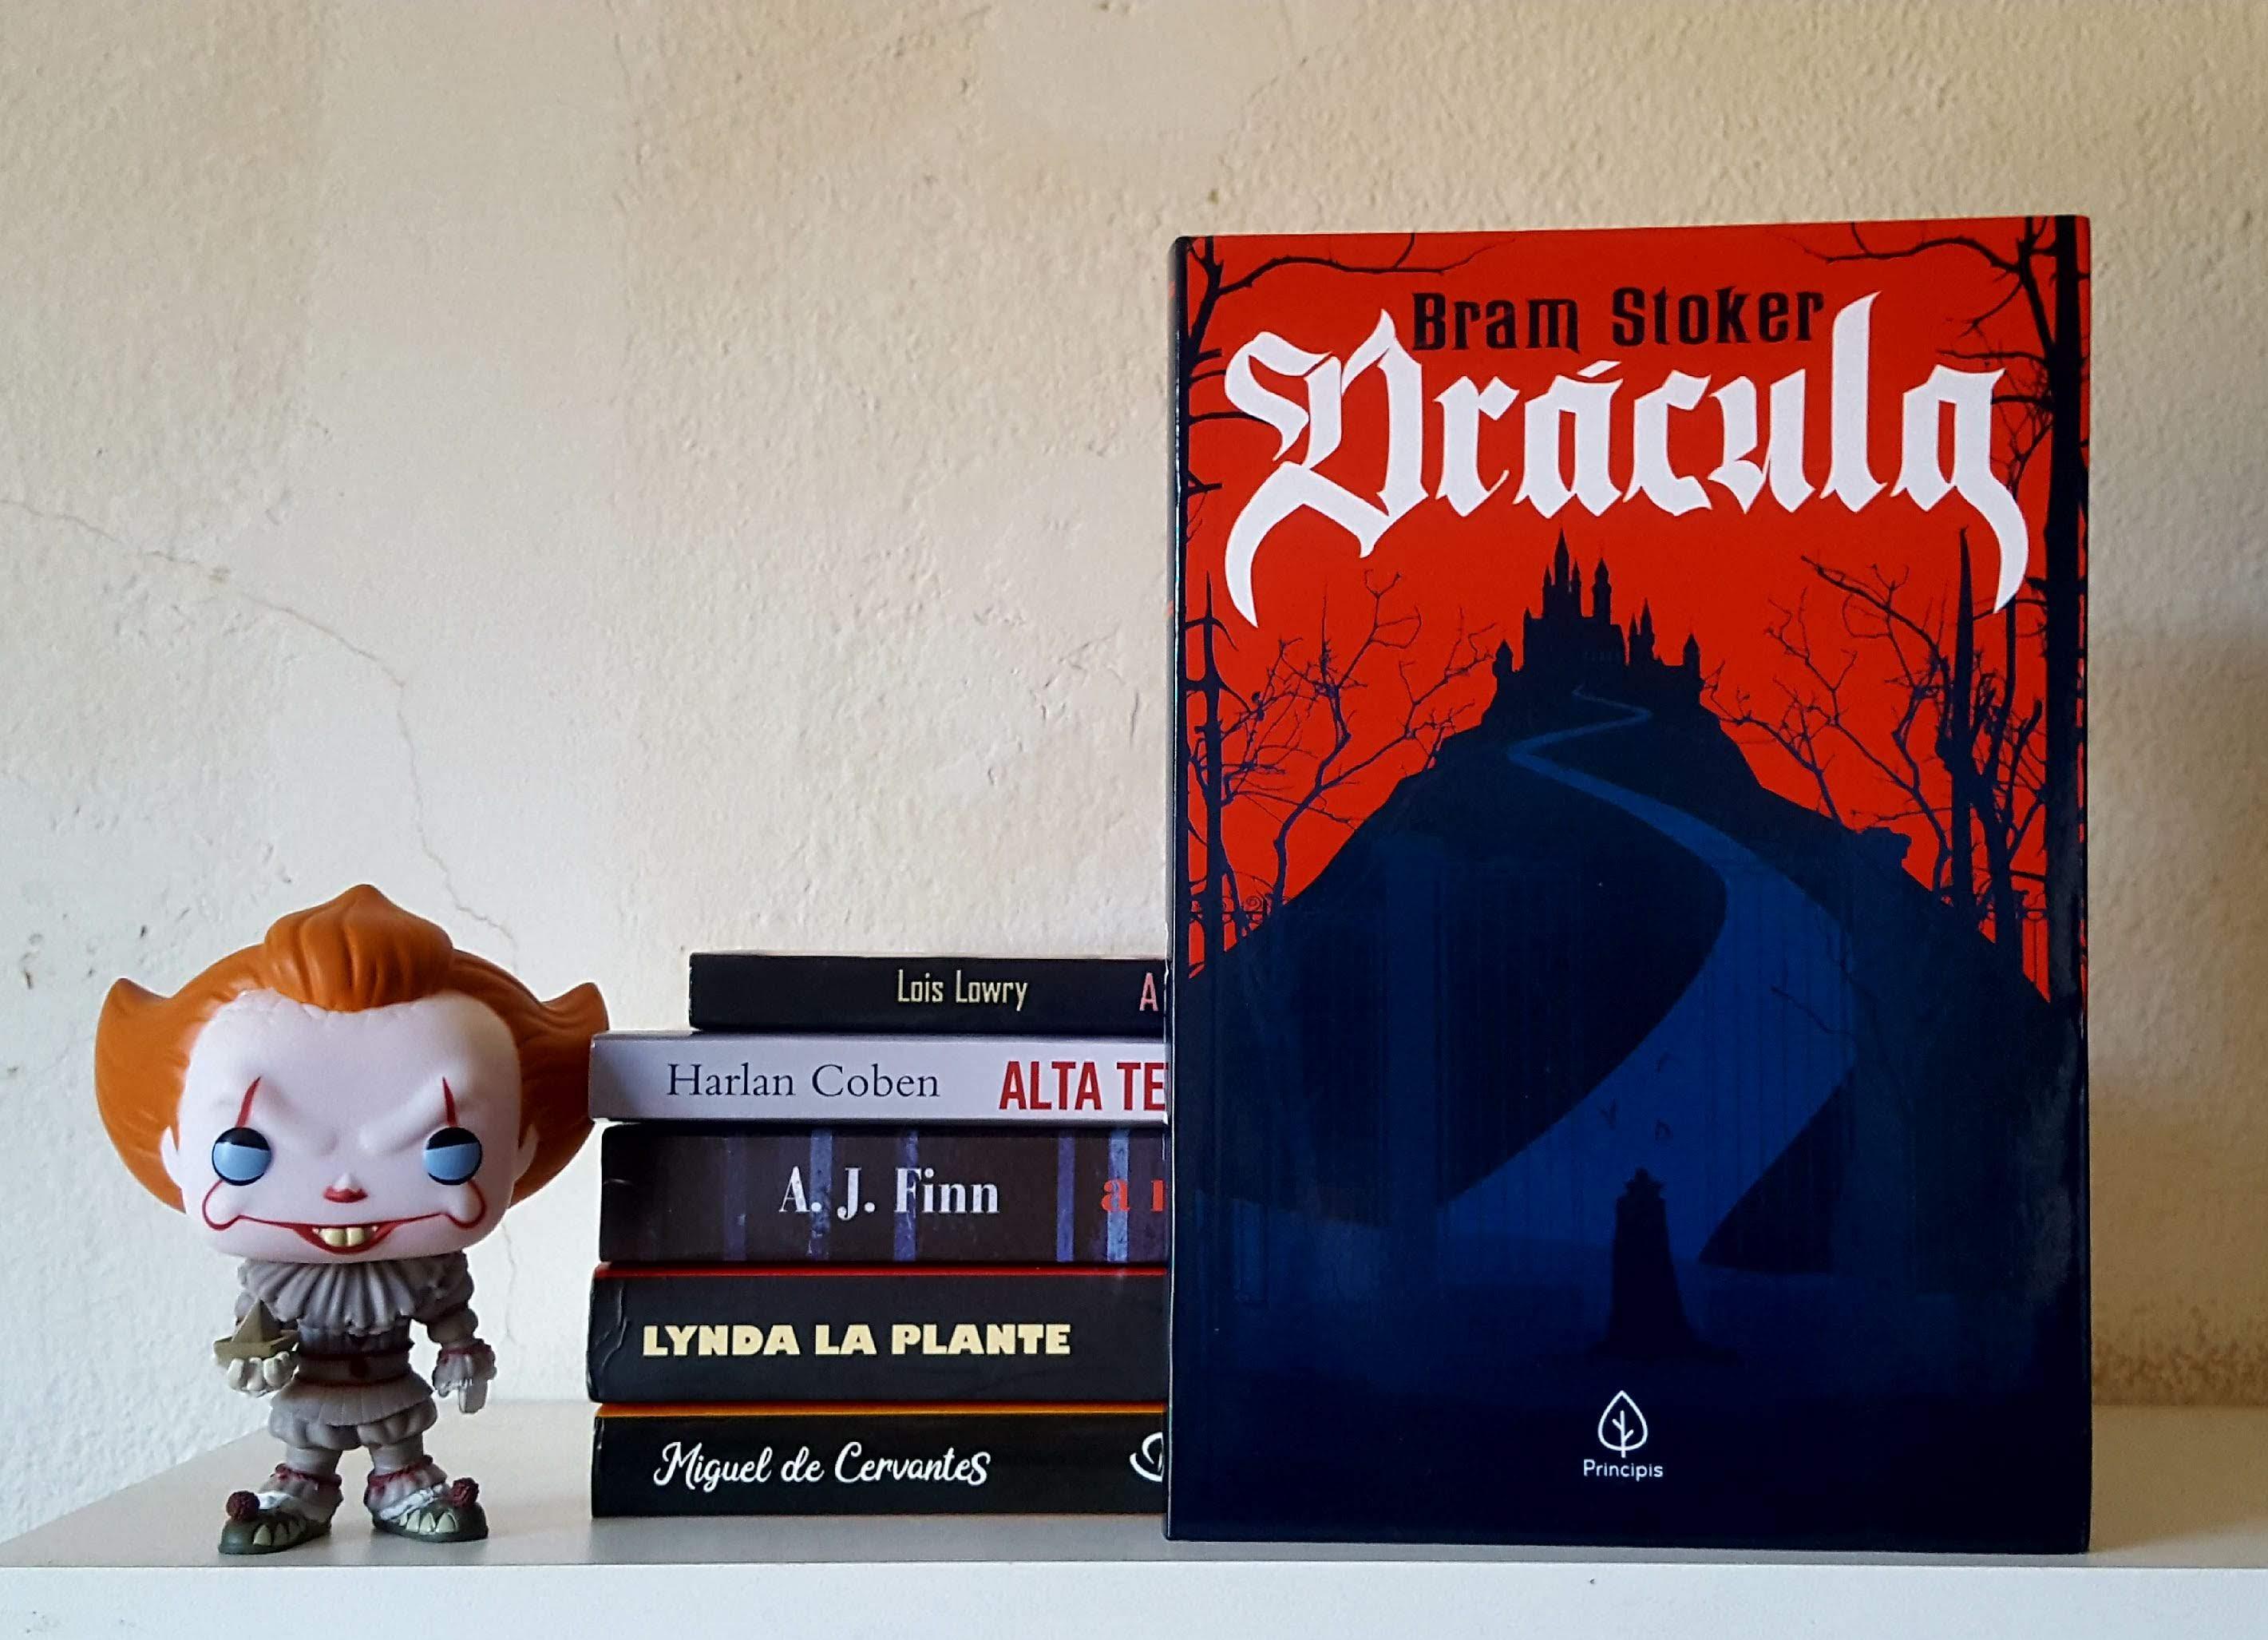 Drácula | Bran Stoker